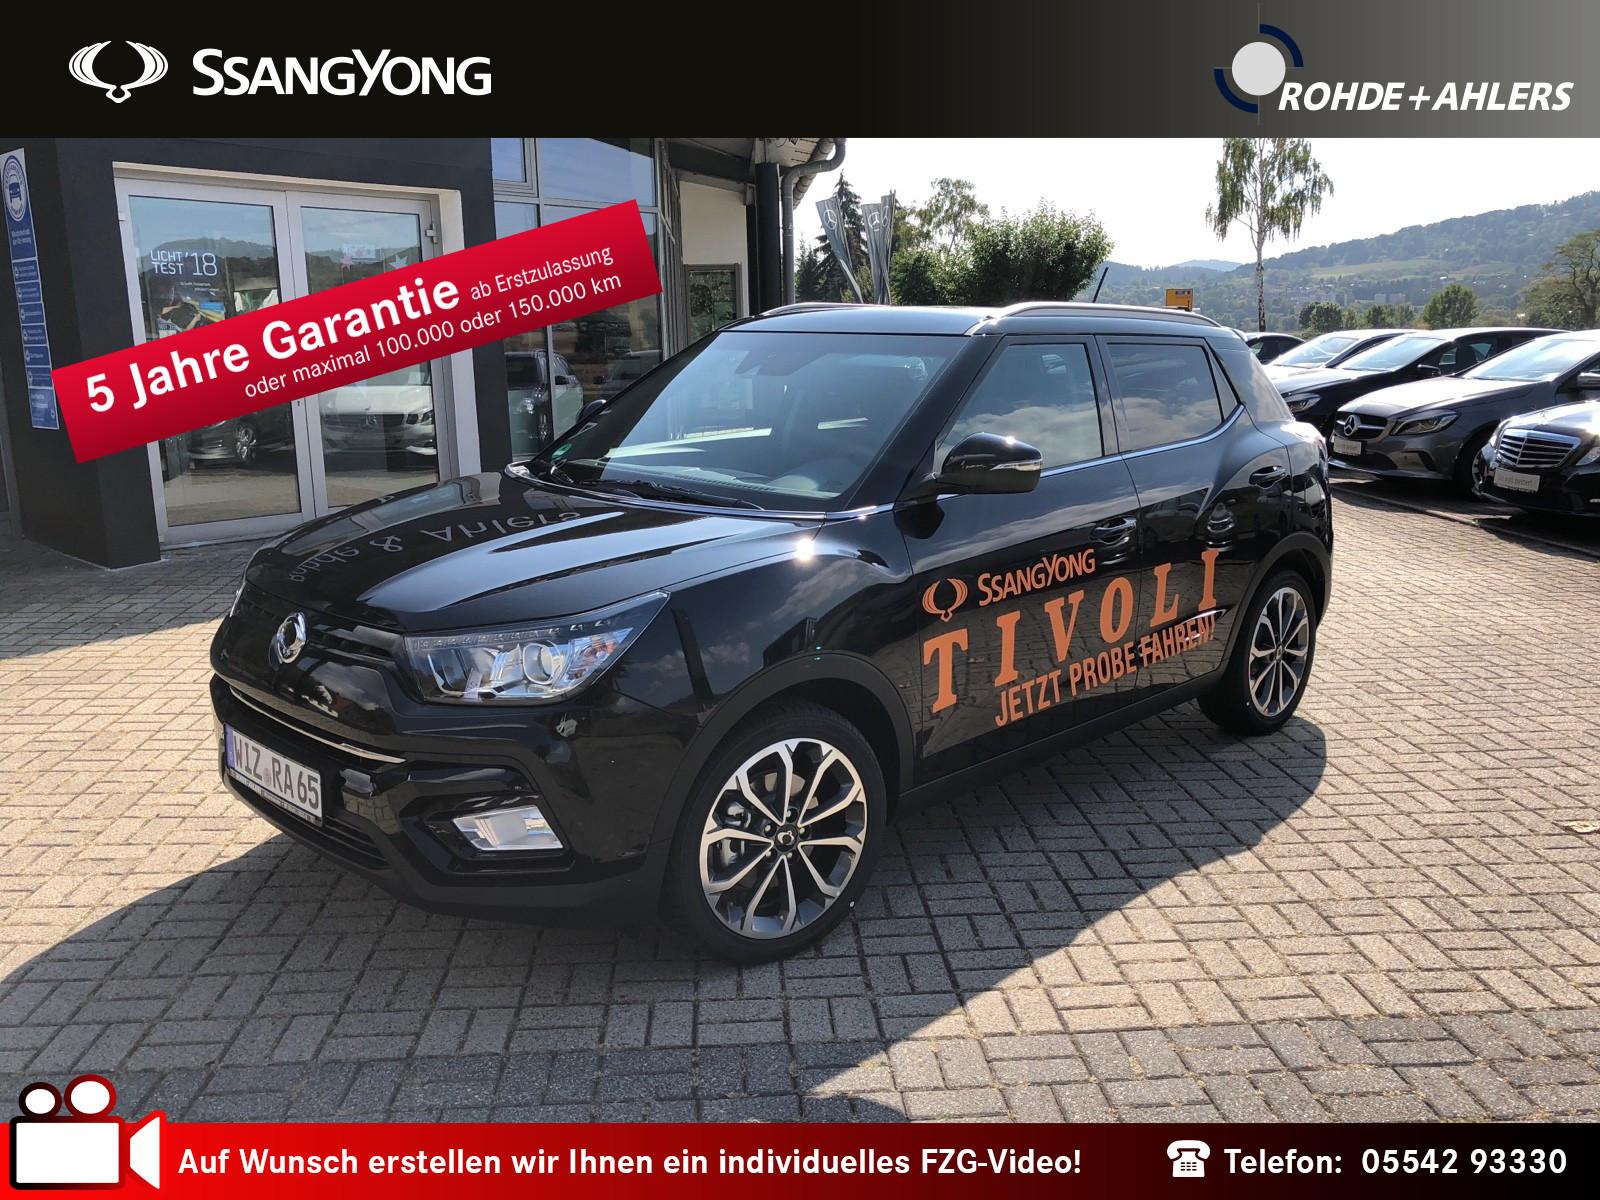 Ssangyong Tivoli Sapphire 1.6 NAVI+KEYLESS+LEDER+KAMERA BC, Jahr 2018, Benzin